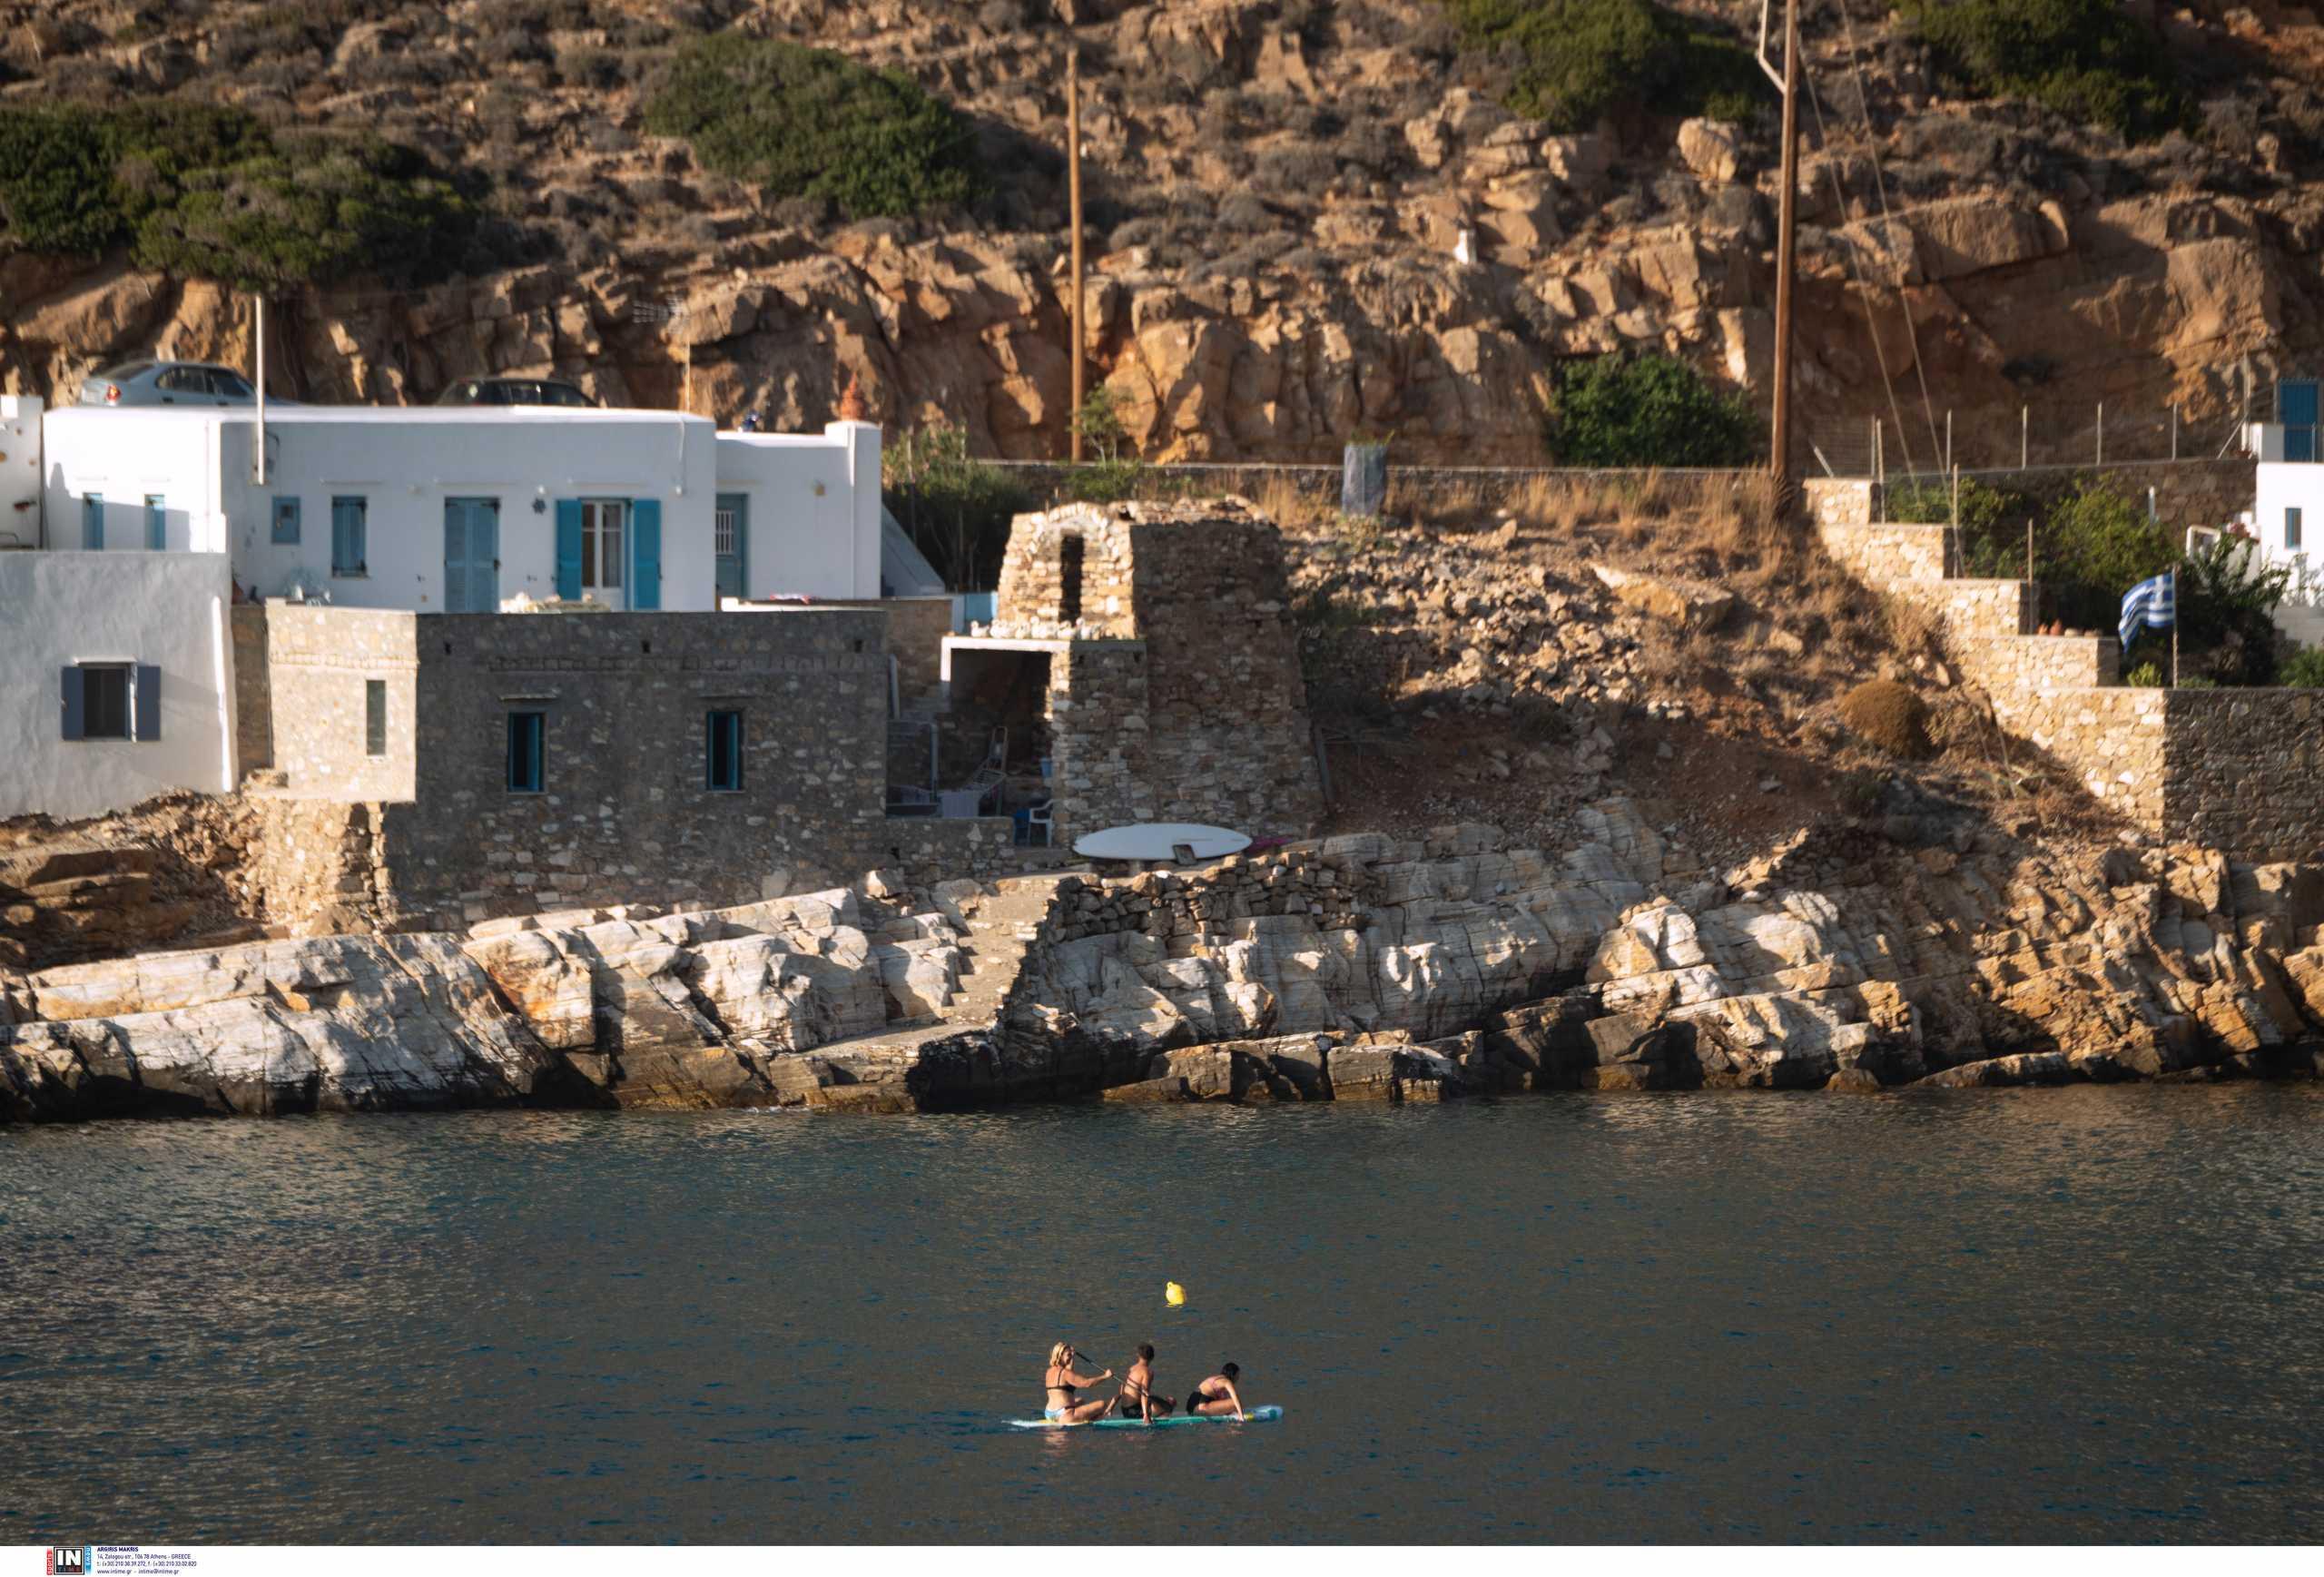 Handelsblatt: Γερμανοί πληρώνουν αδρά για ένα σπίτι κάτω από τον ελληνικό ουρανό